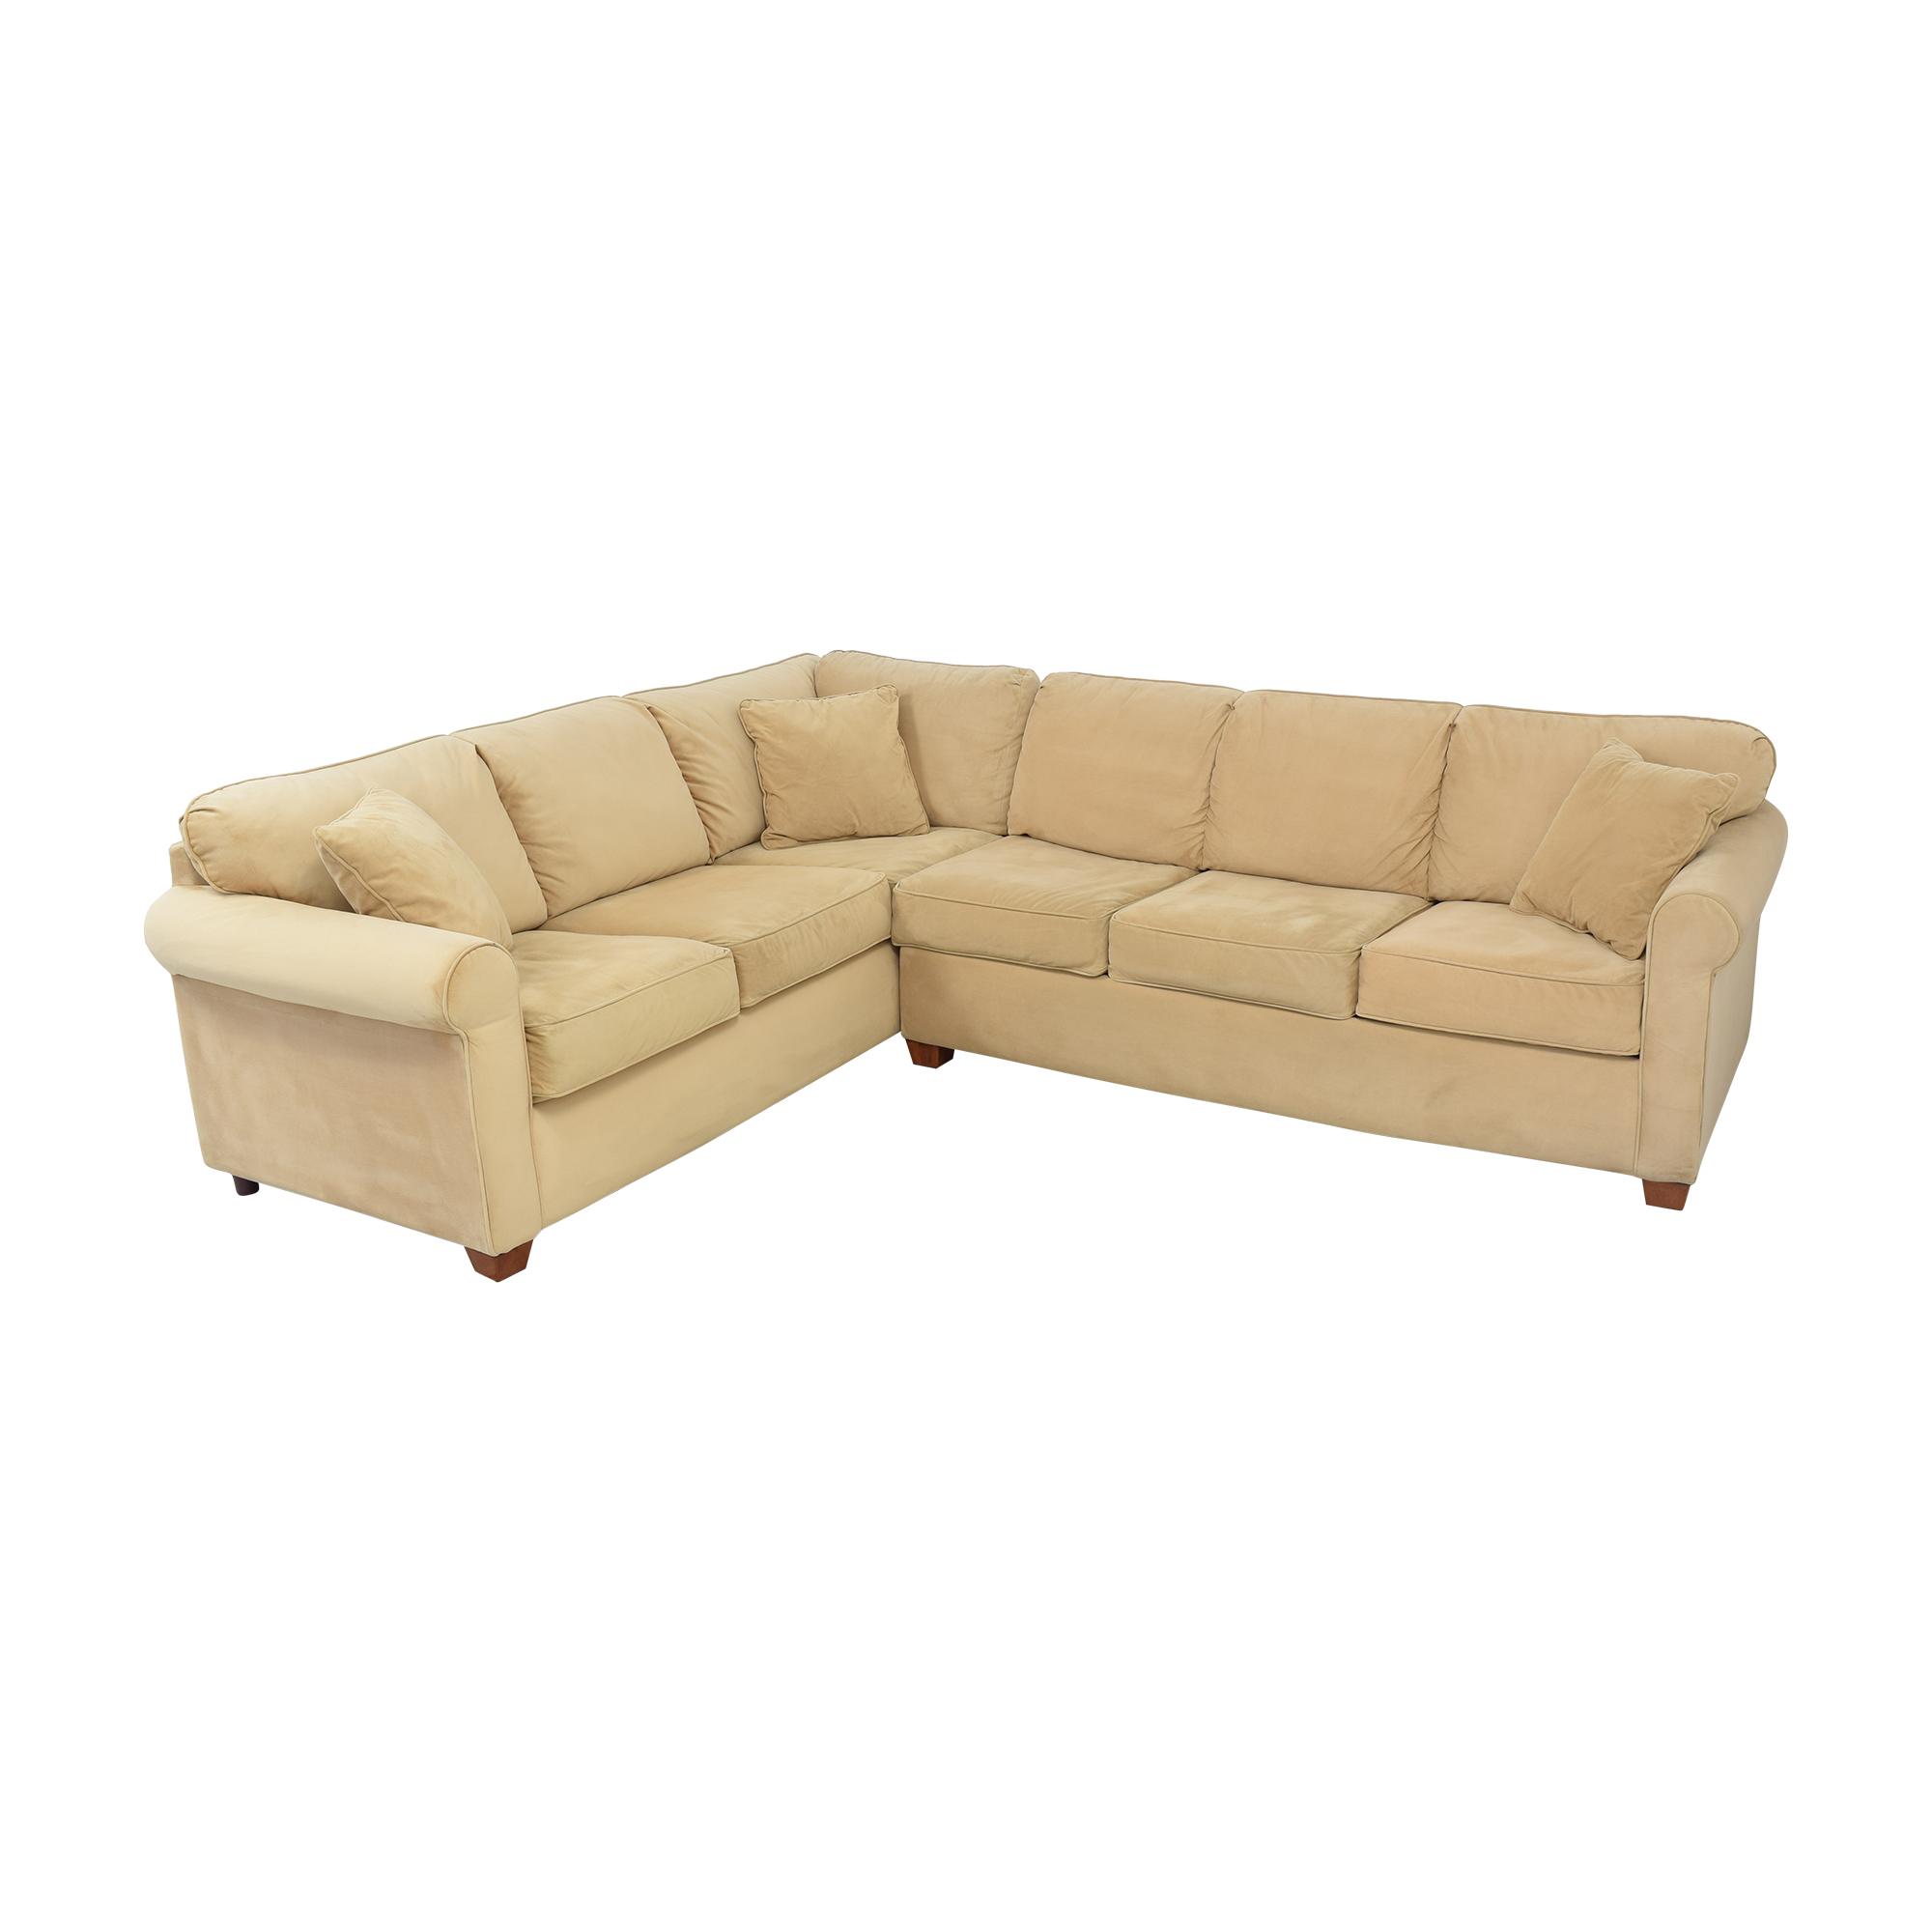 Raymour & Flanigan Raymour & Flanigan Sectional Sofa for sale